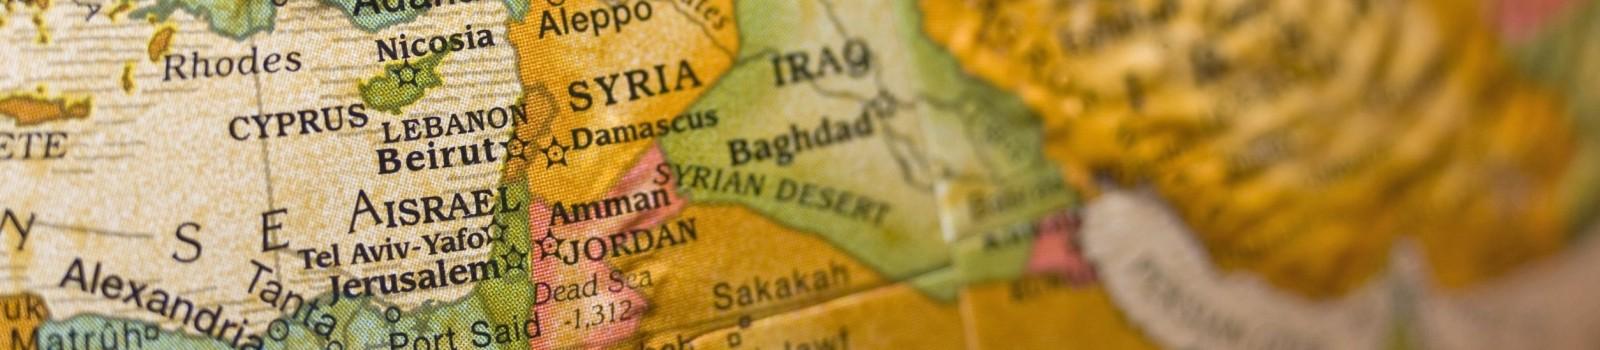 Original insights syria UK public opinion